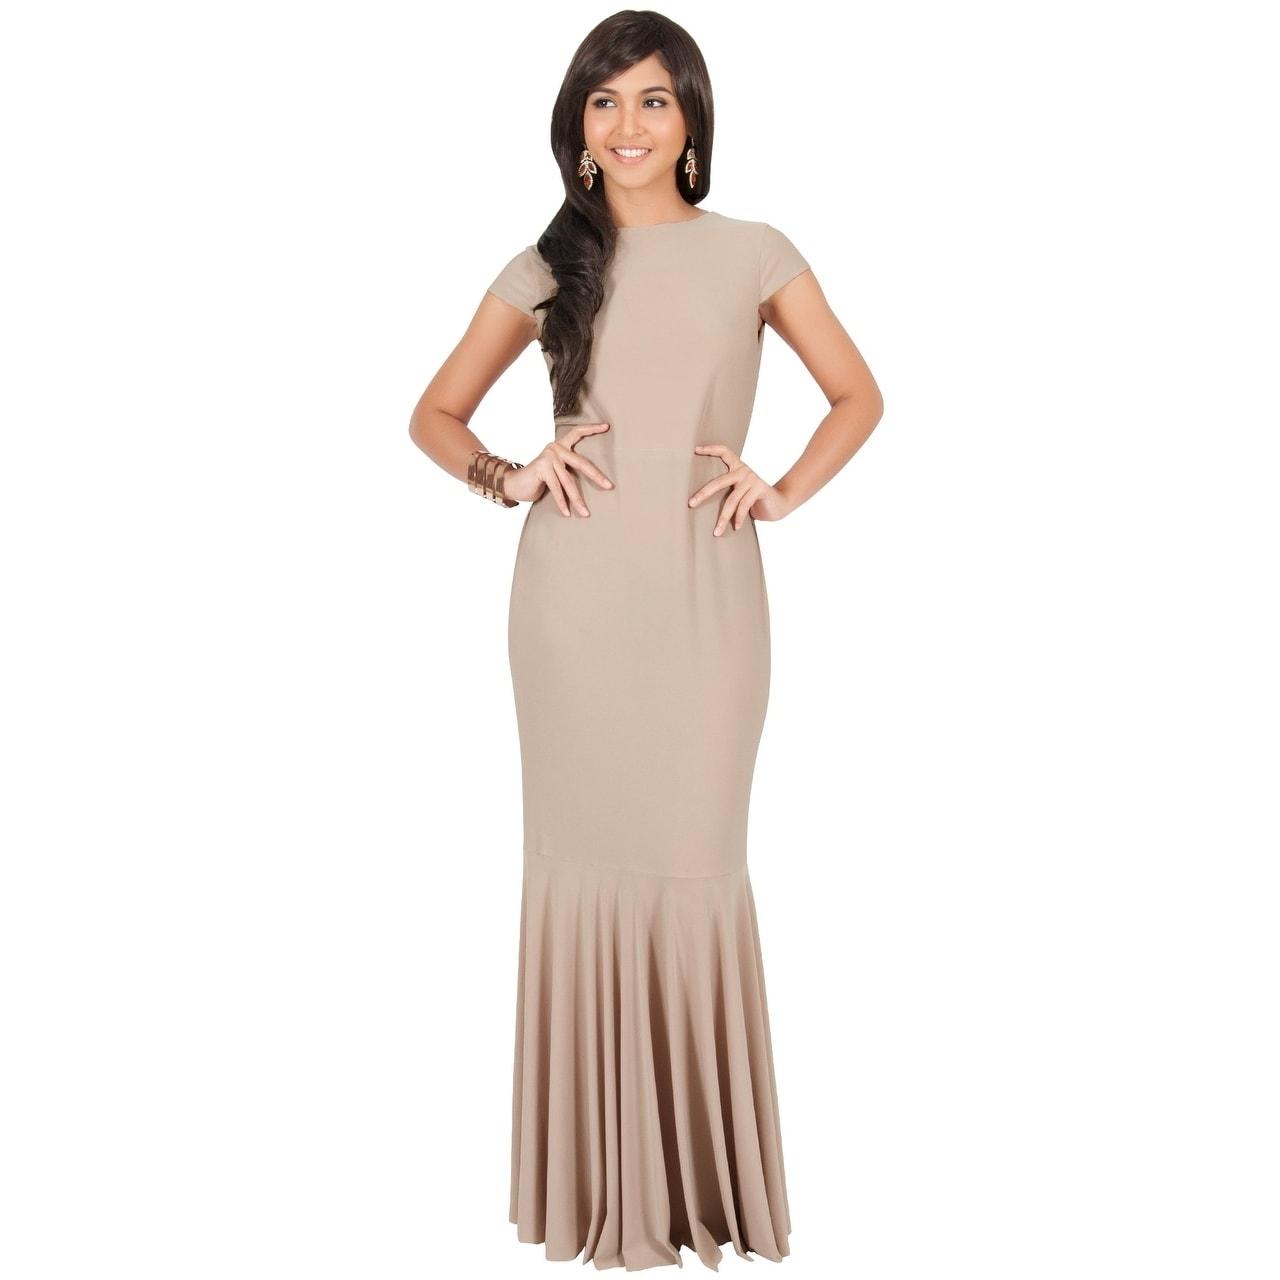 e5df1f03e0f6 Shop KOH KOH Women s Cap Sleeve Mermaid Cocktail Dress - Free ...